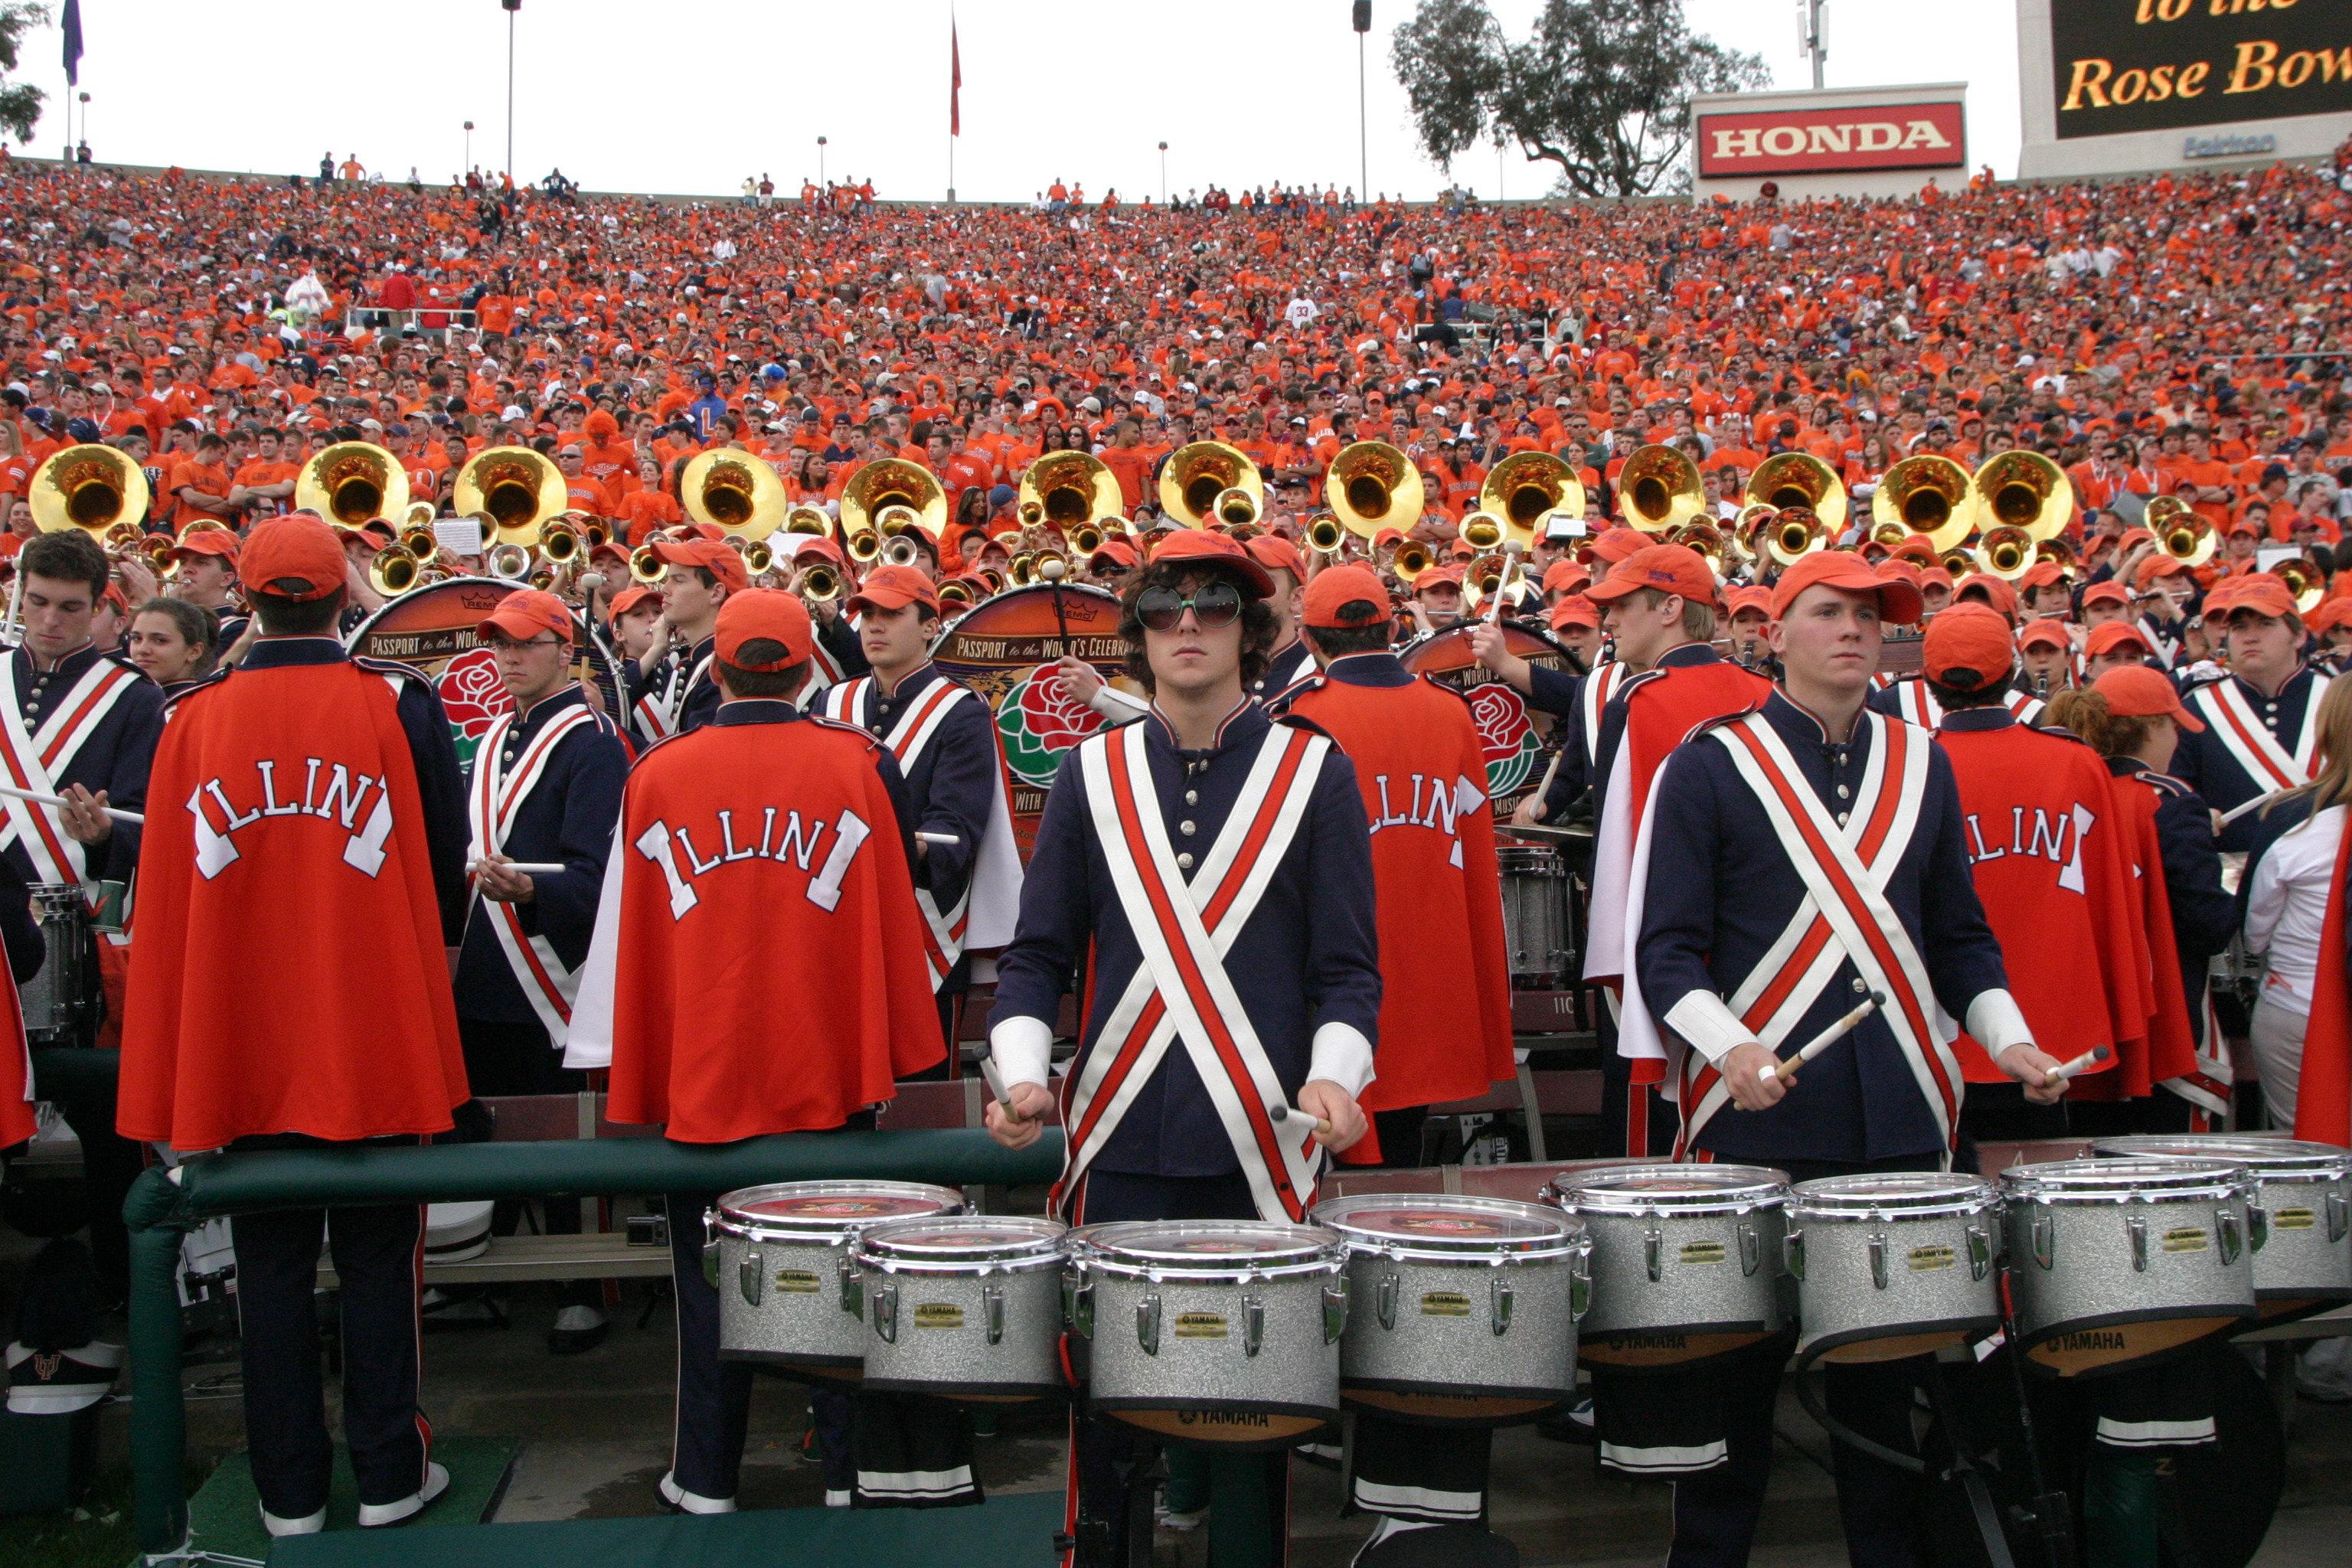 Football - NCAA Rose Bowl - Illinois vs. USC